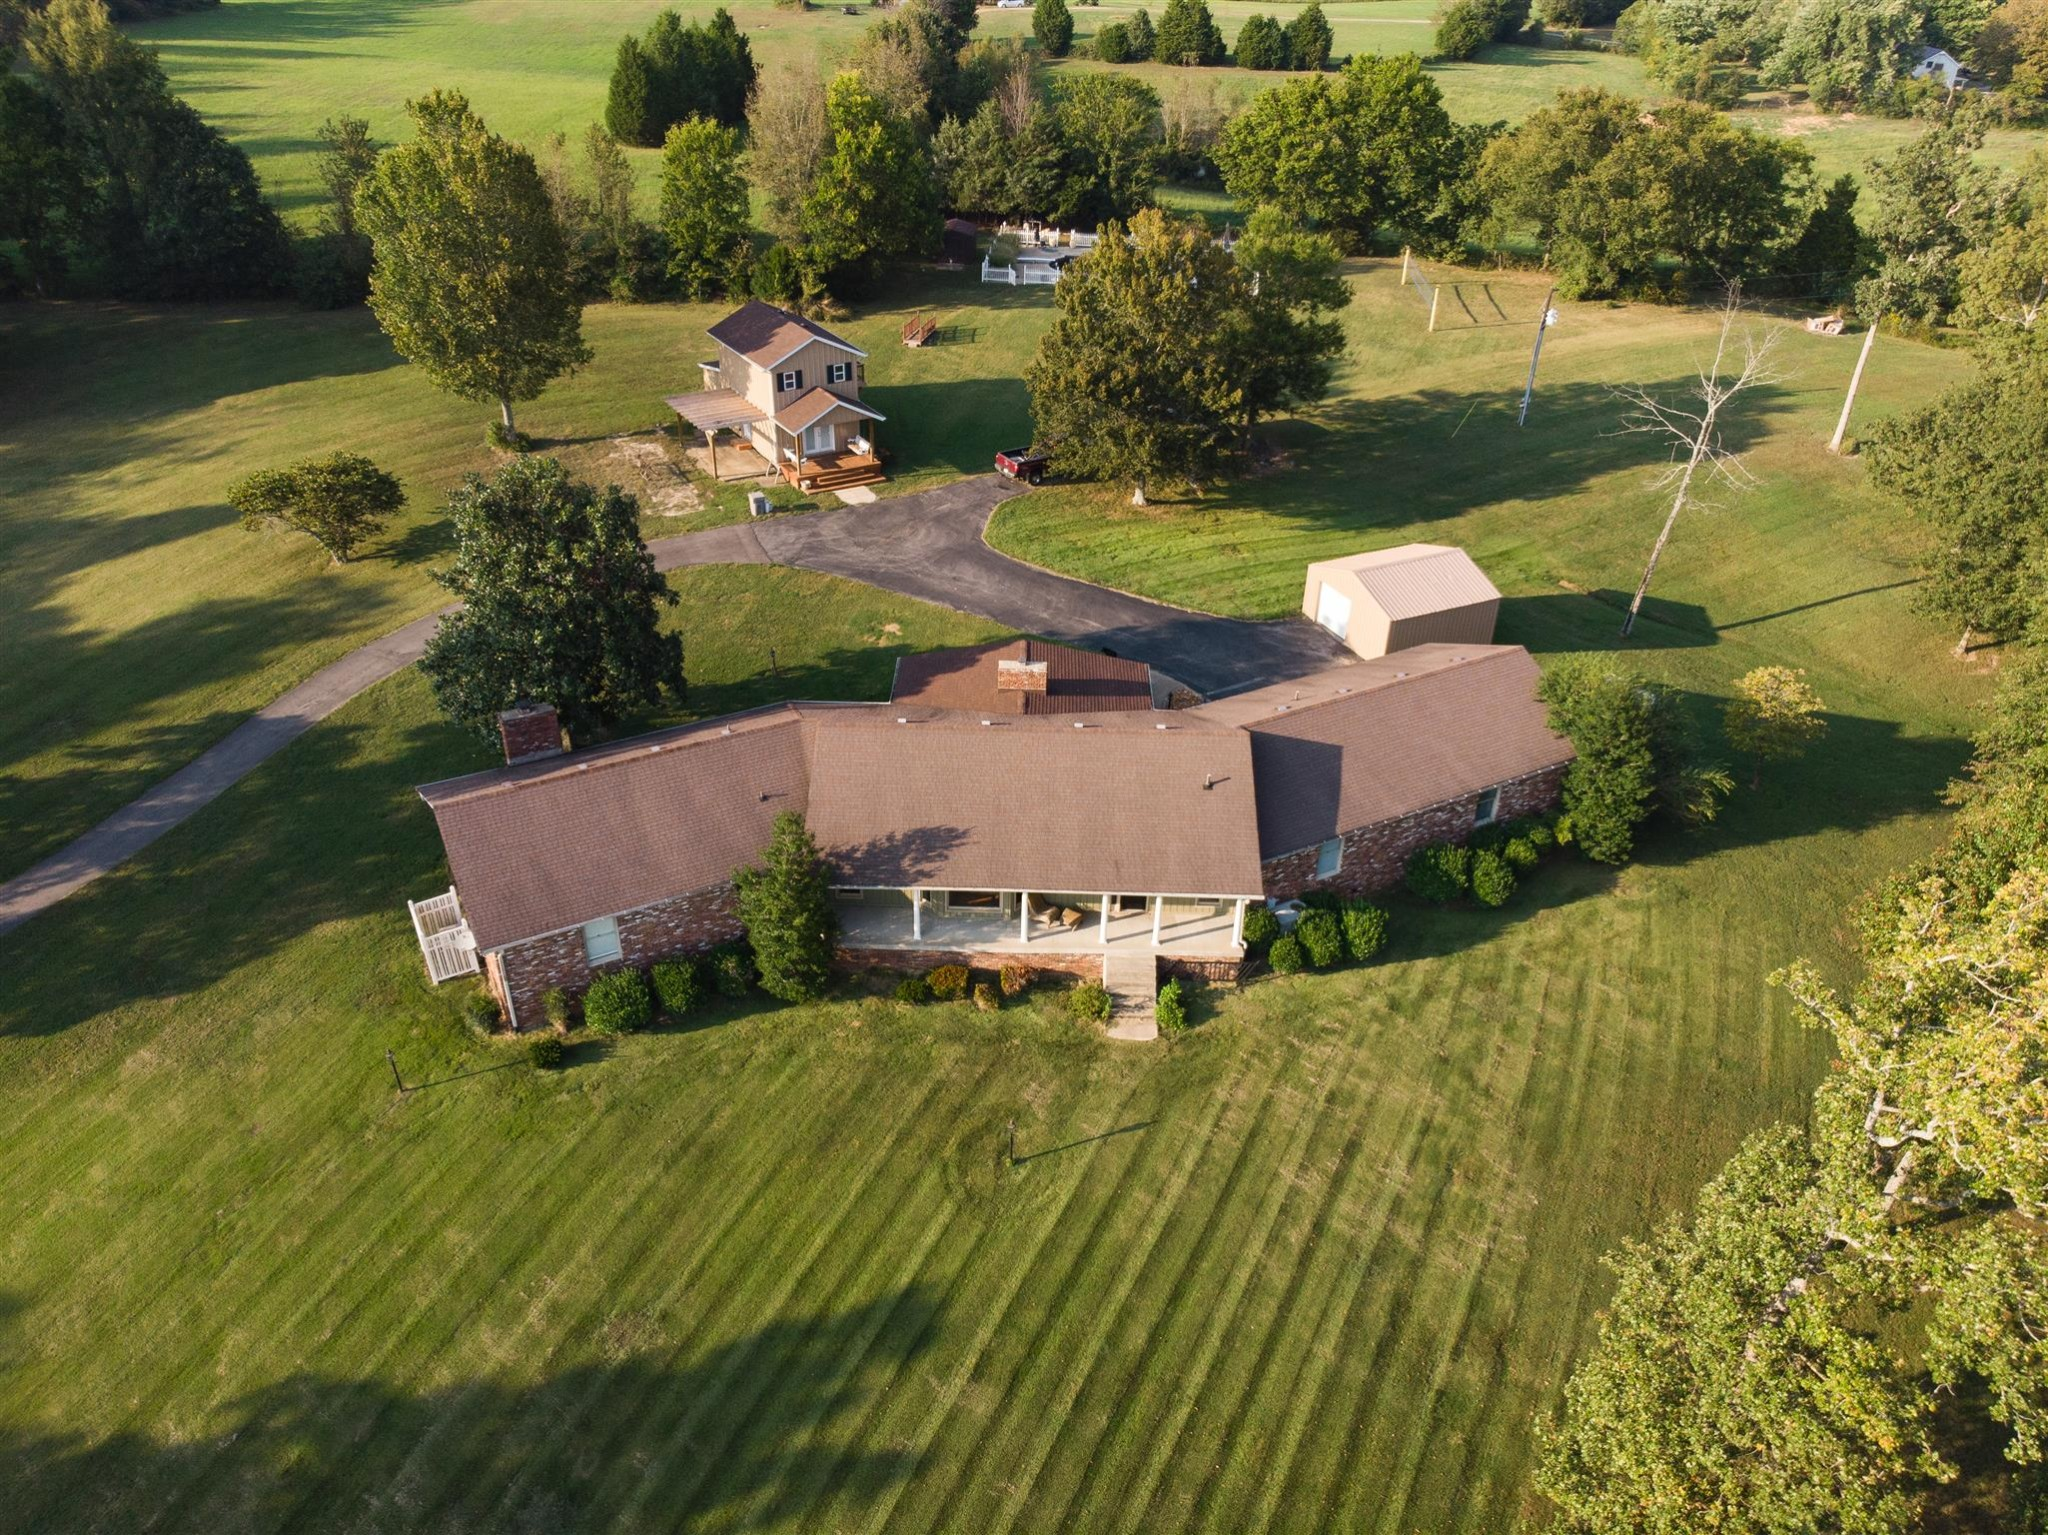 2732 Jack Teasley Rd, Pleasant View, TN 37146 - Pleasant View, TN real estate listing